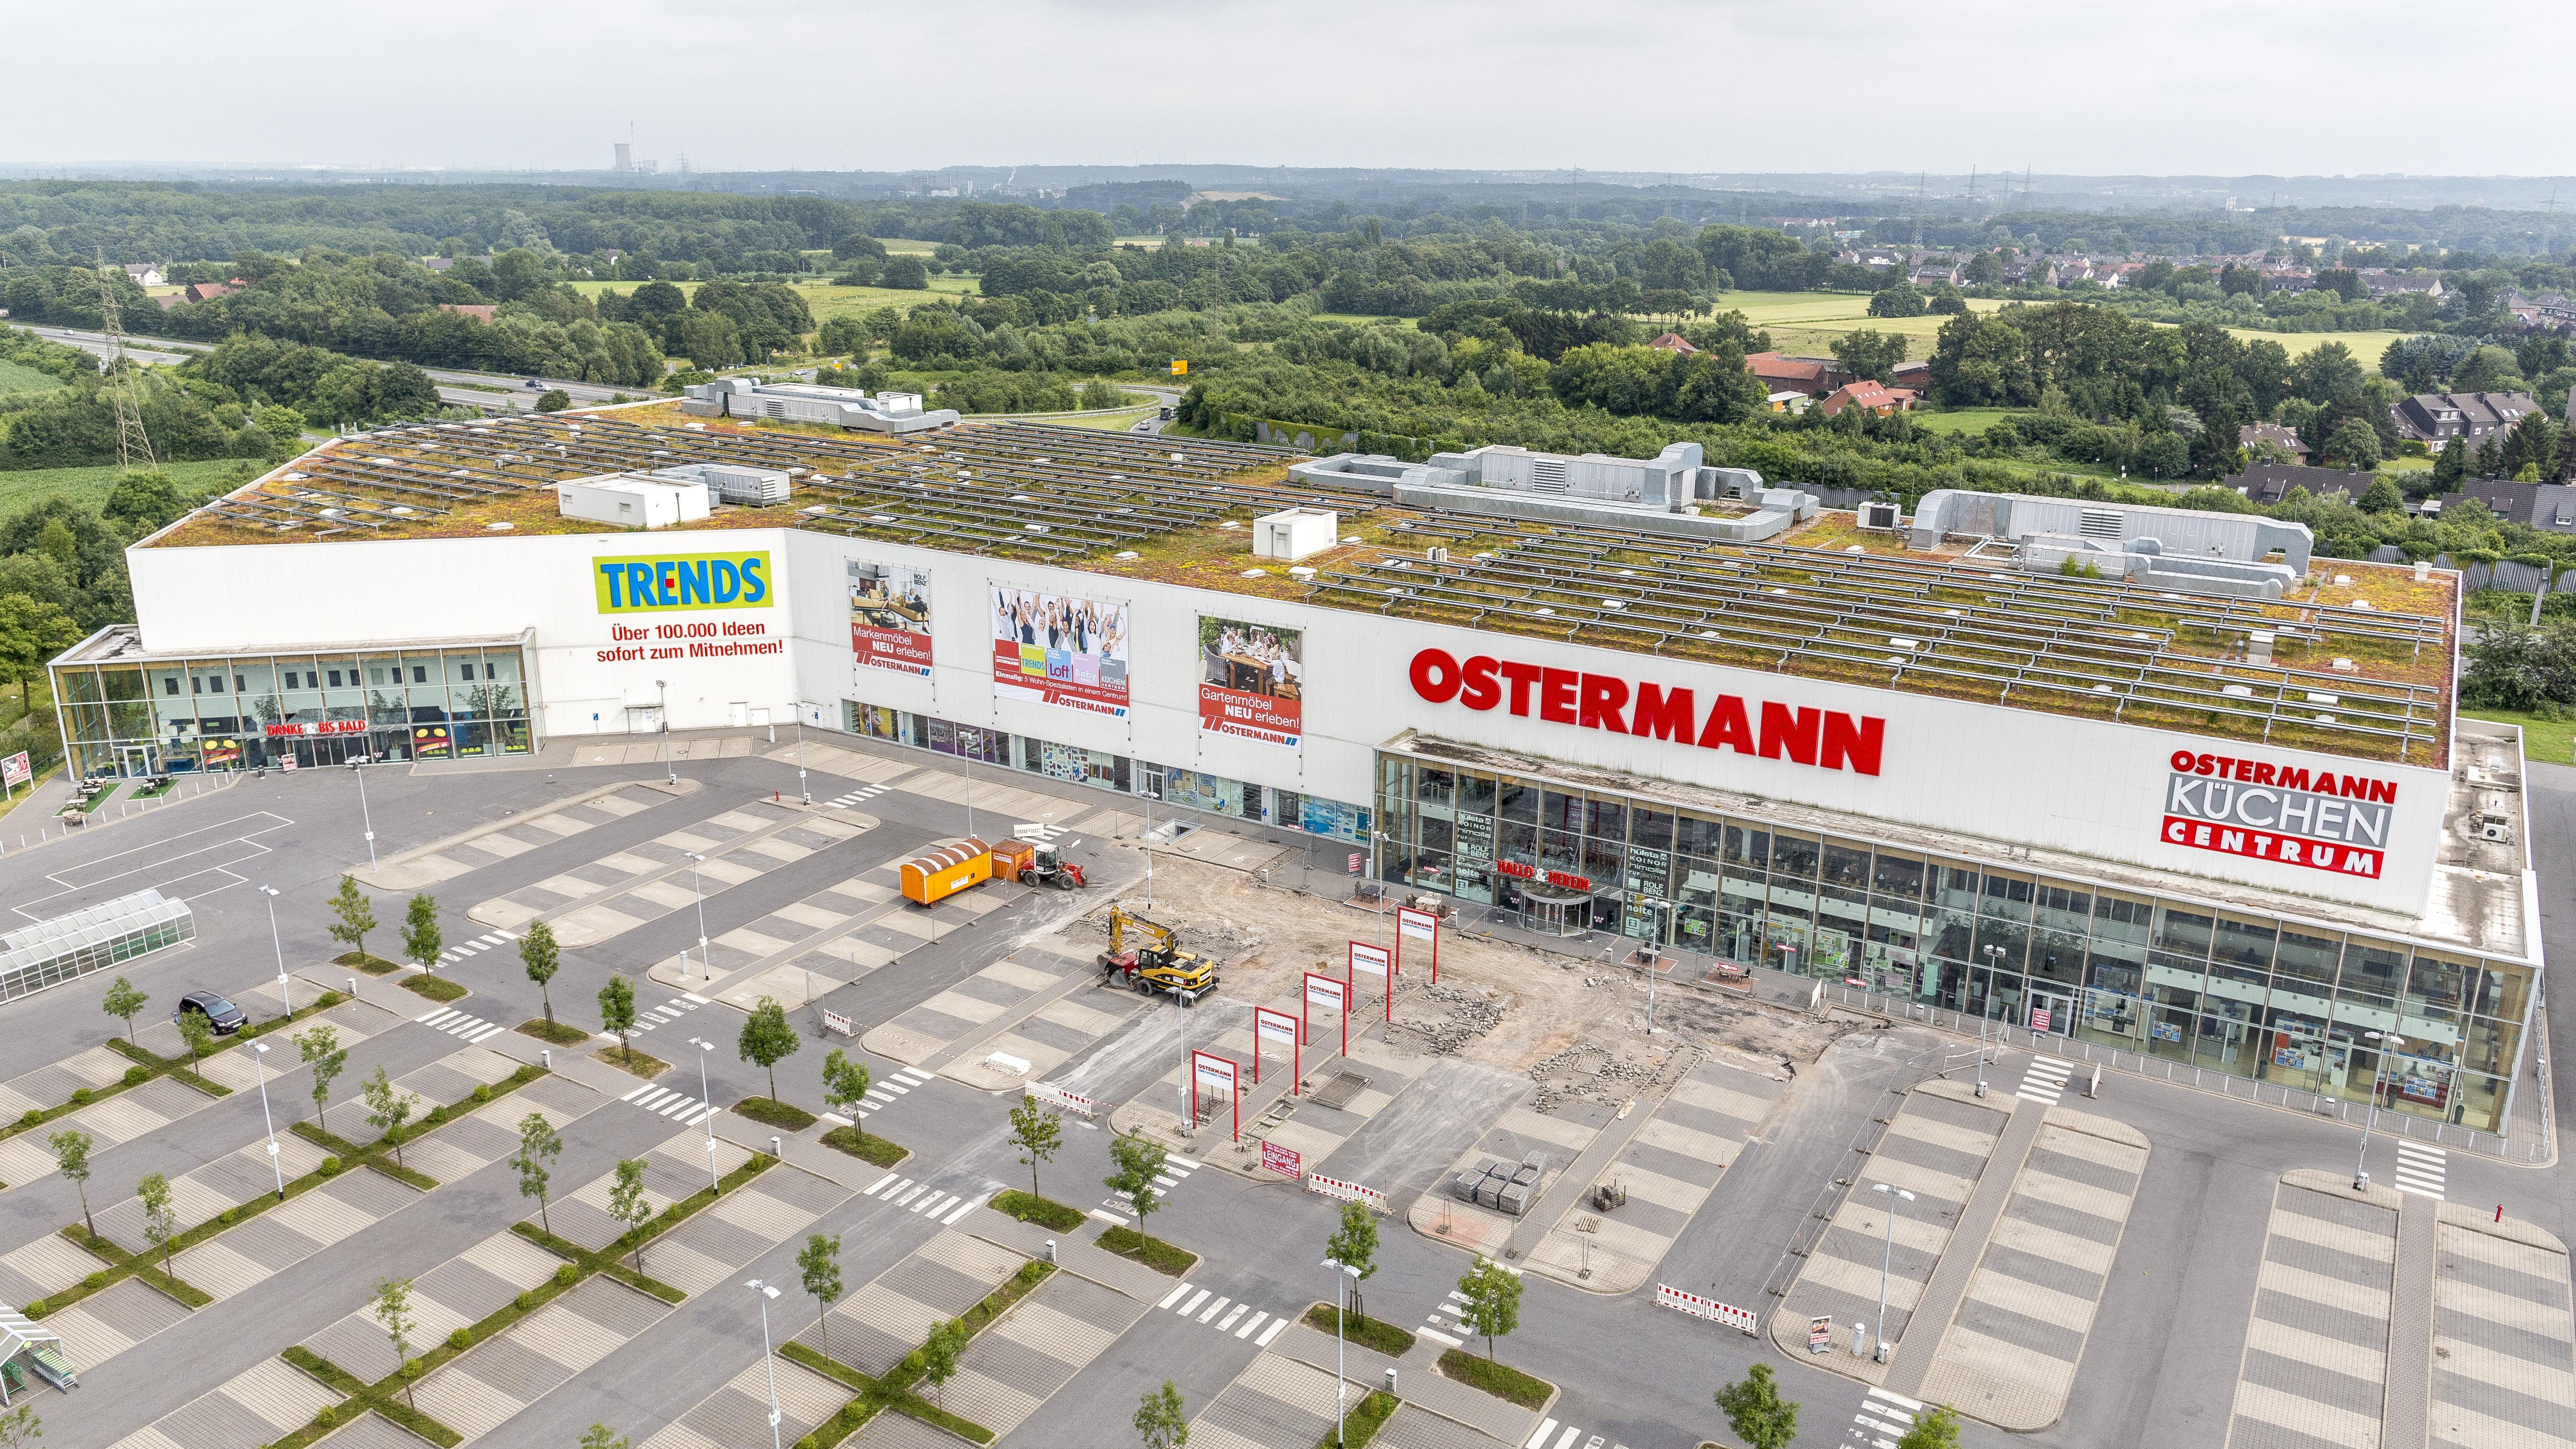 Ostermann_02